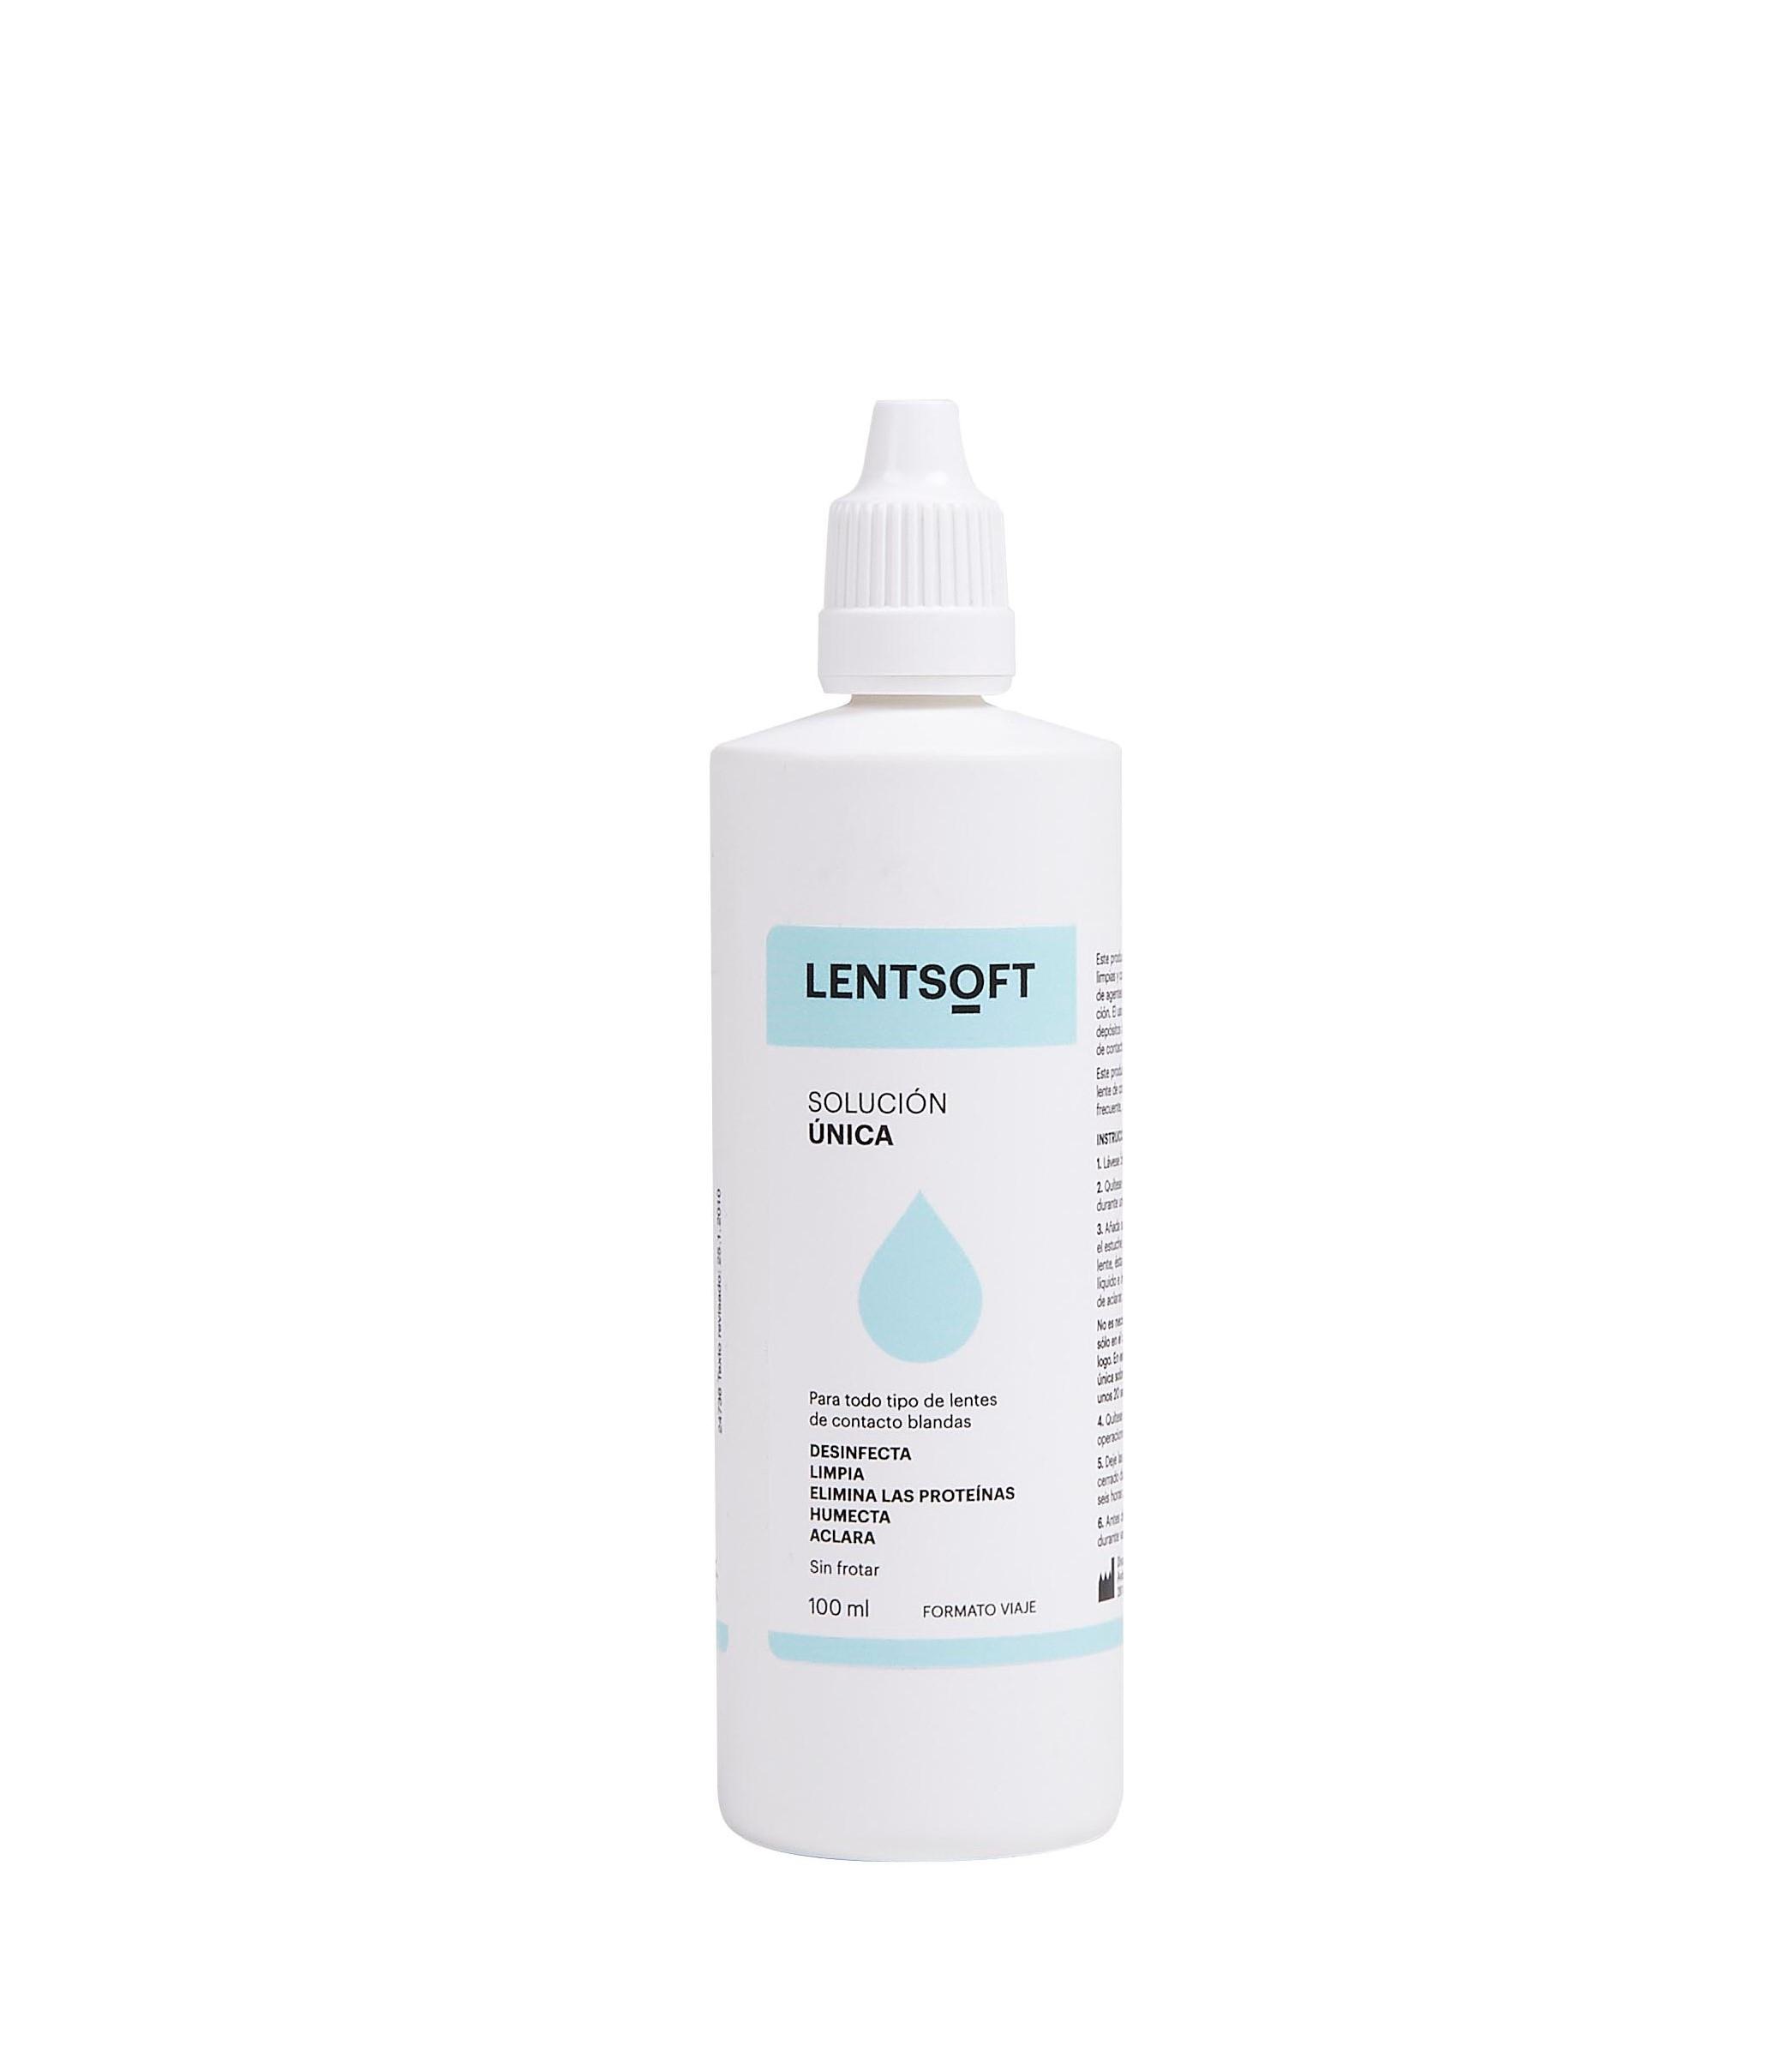 LENTSOFT 100 ML (VIAJE) nuevo packagging